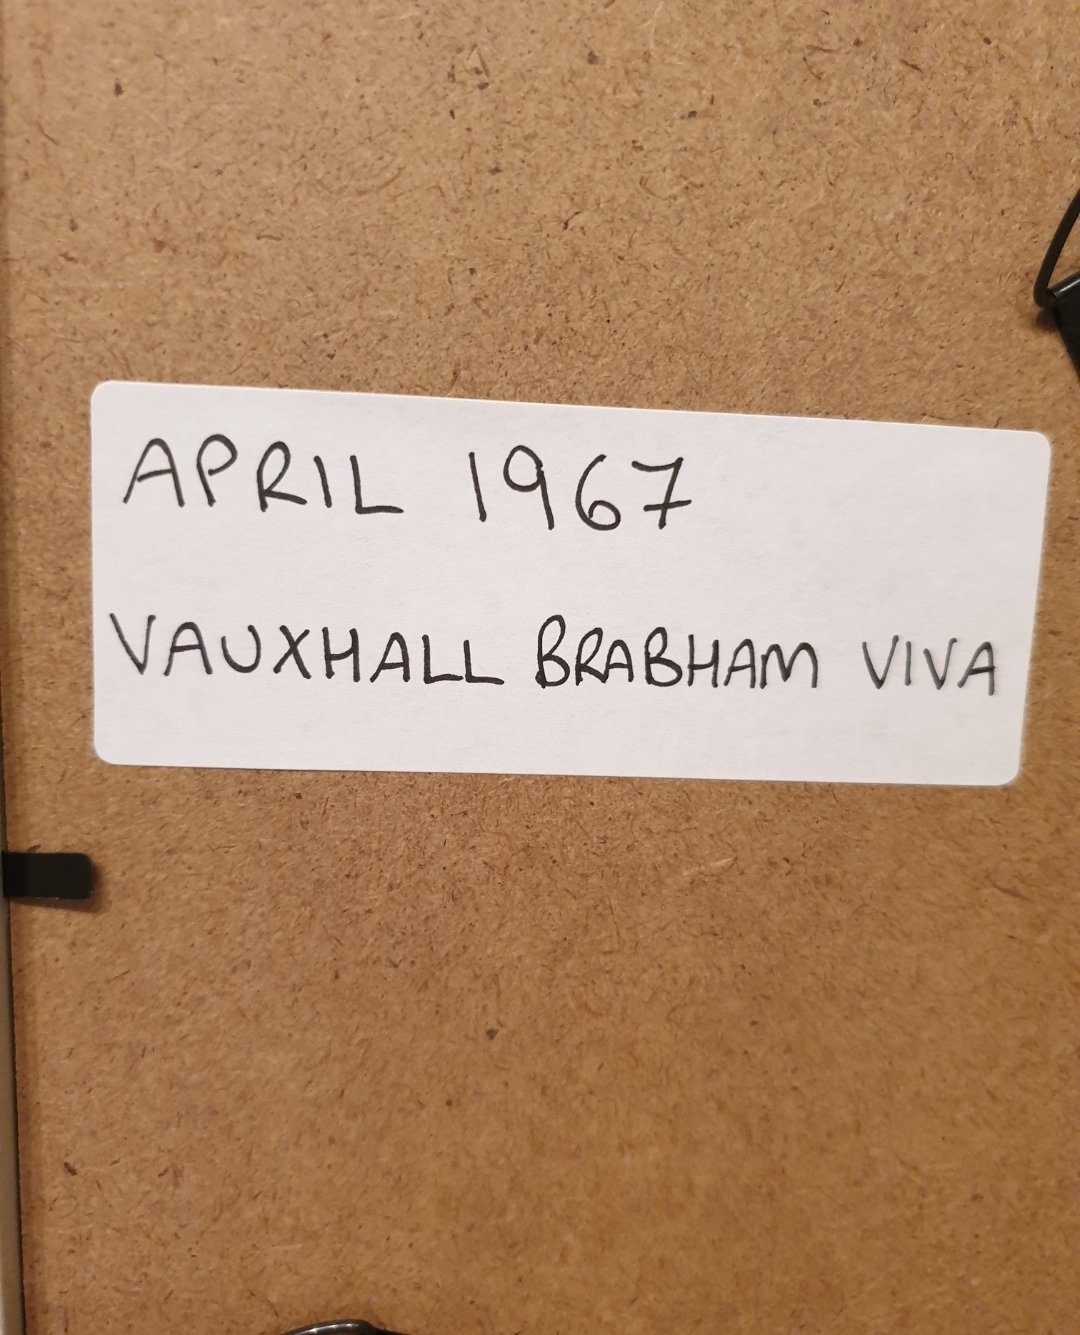 1967 Vauxhall Brabham Viva Advert Original  For Sale (picture 2 of 2)